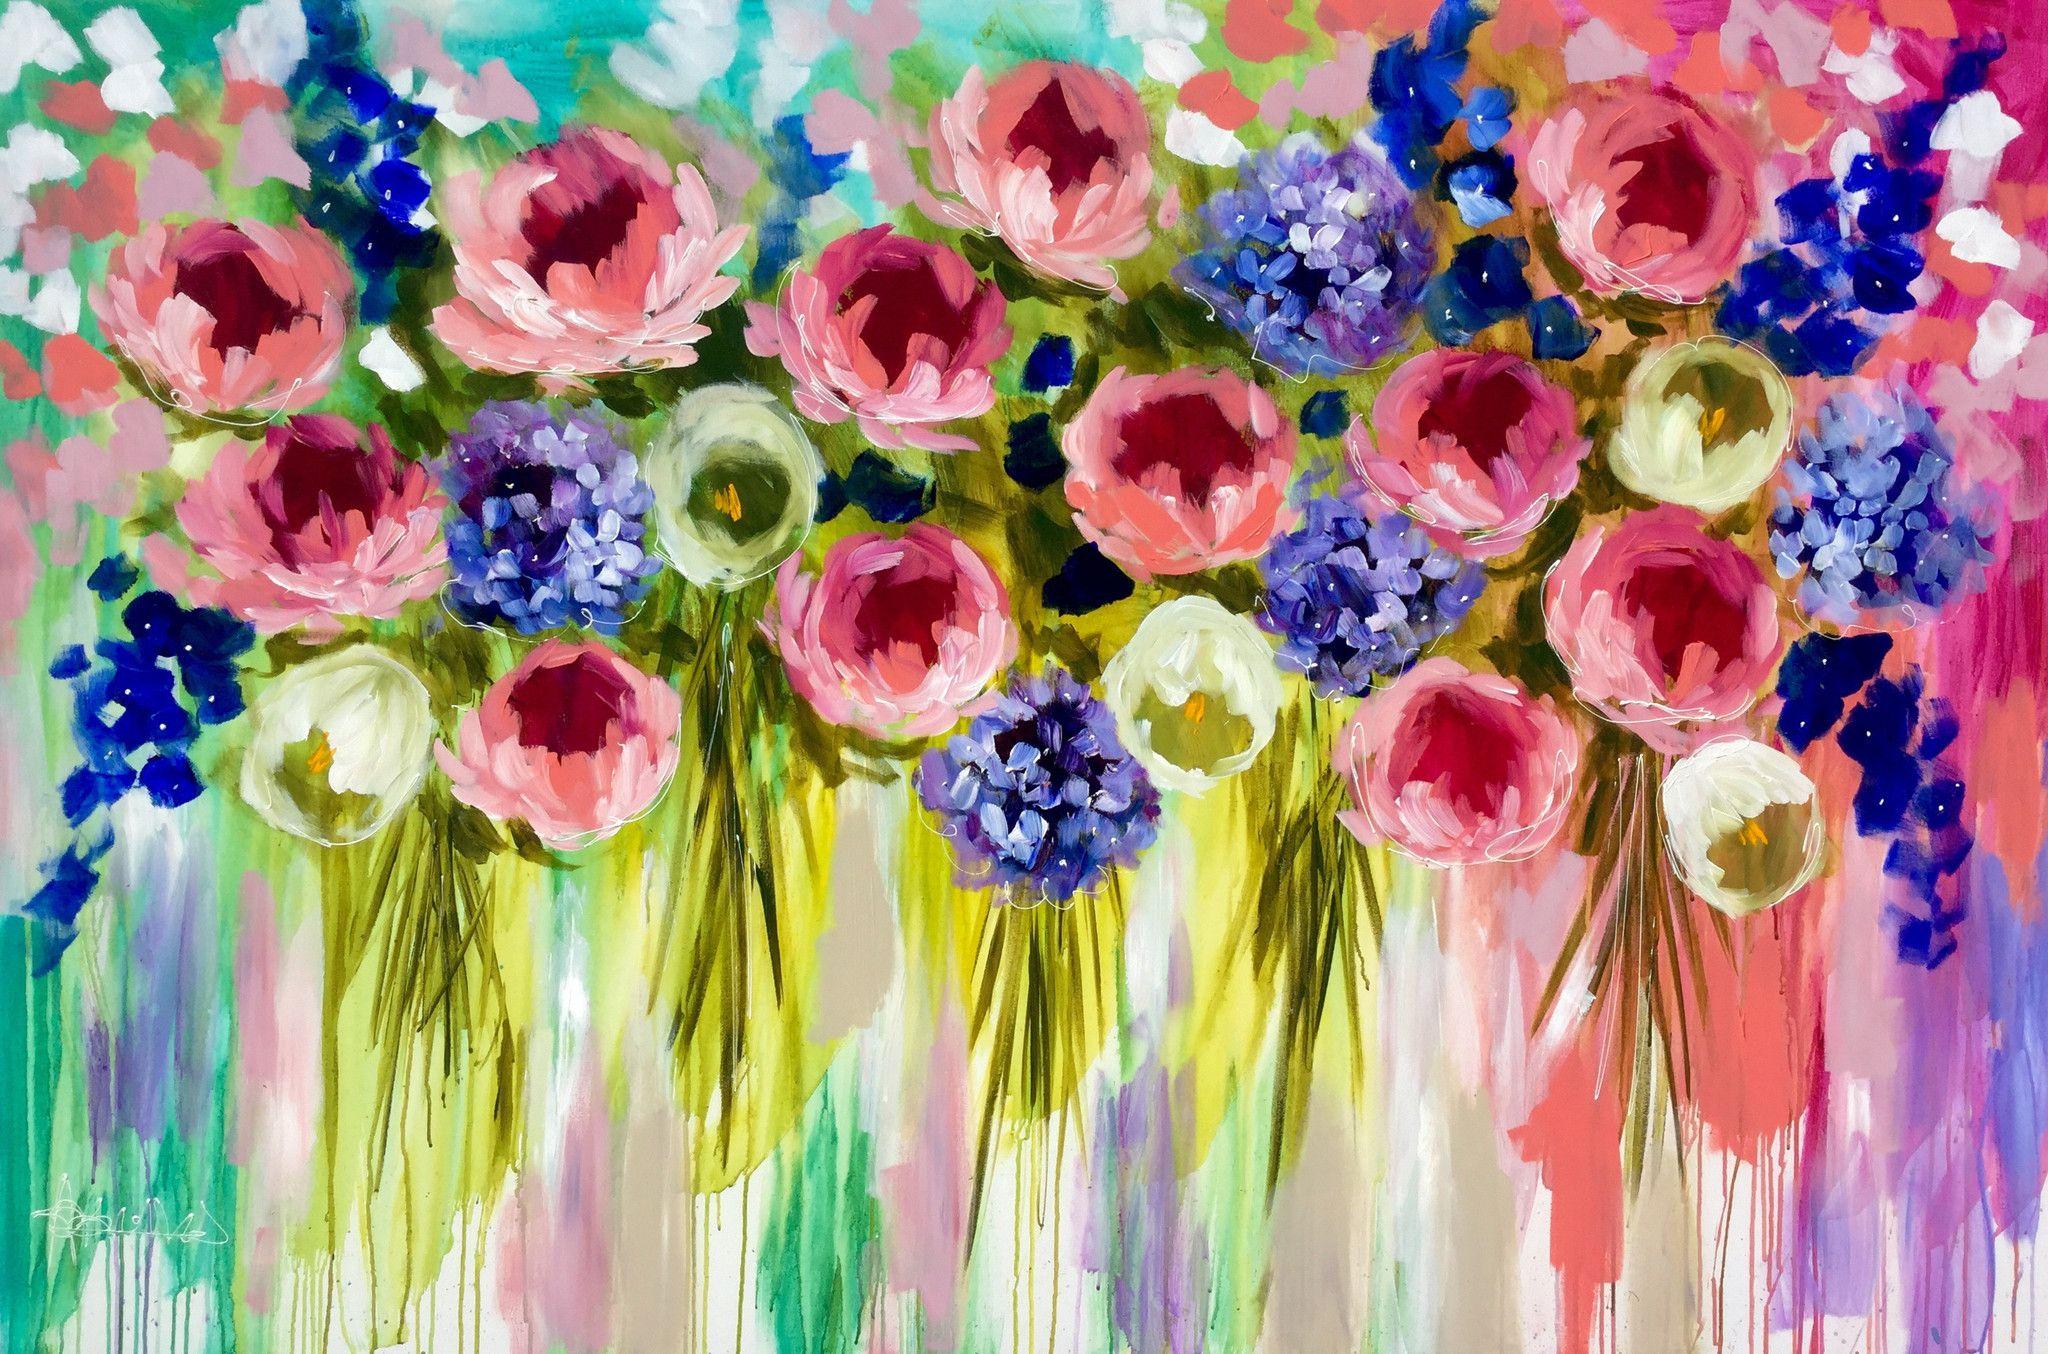 eternal season - original on canvas 120 x180 cm